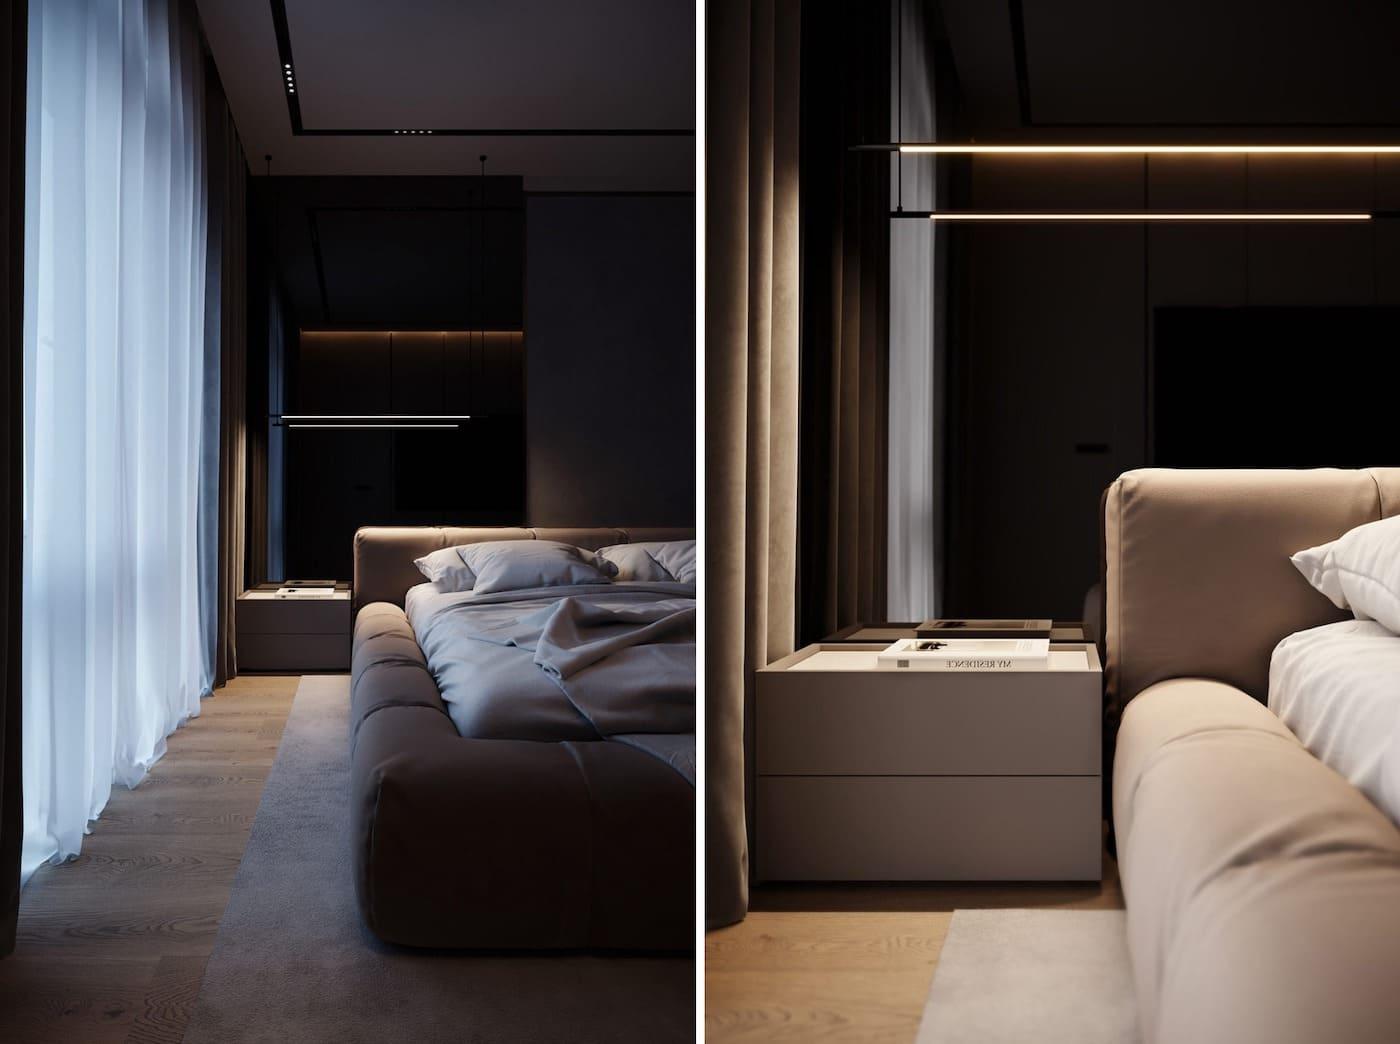 дизайн интерьера модной квартиры фото 7